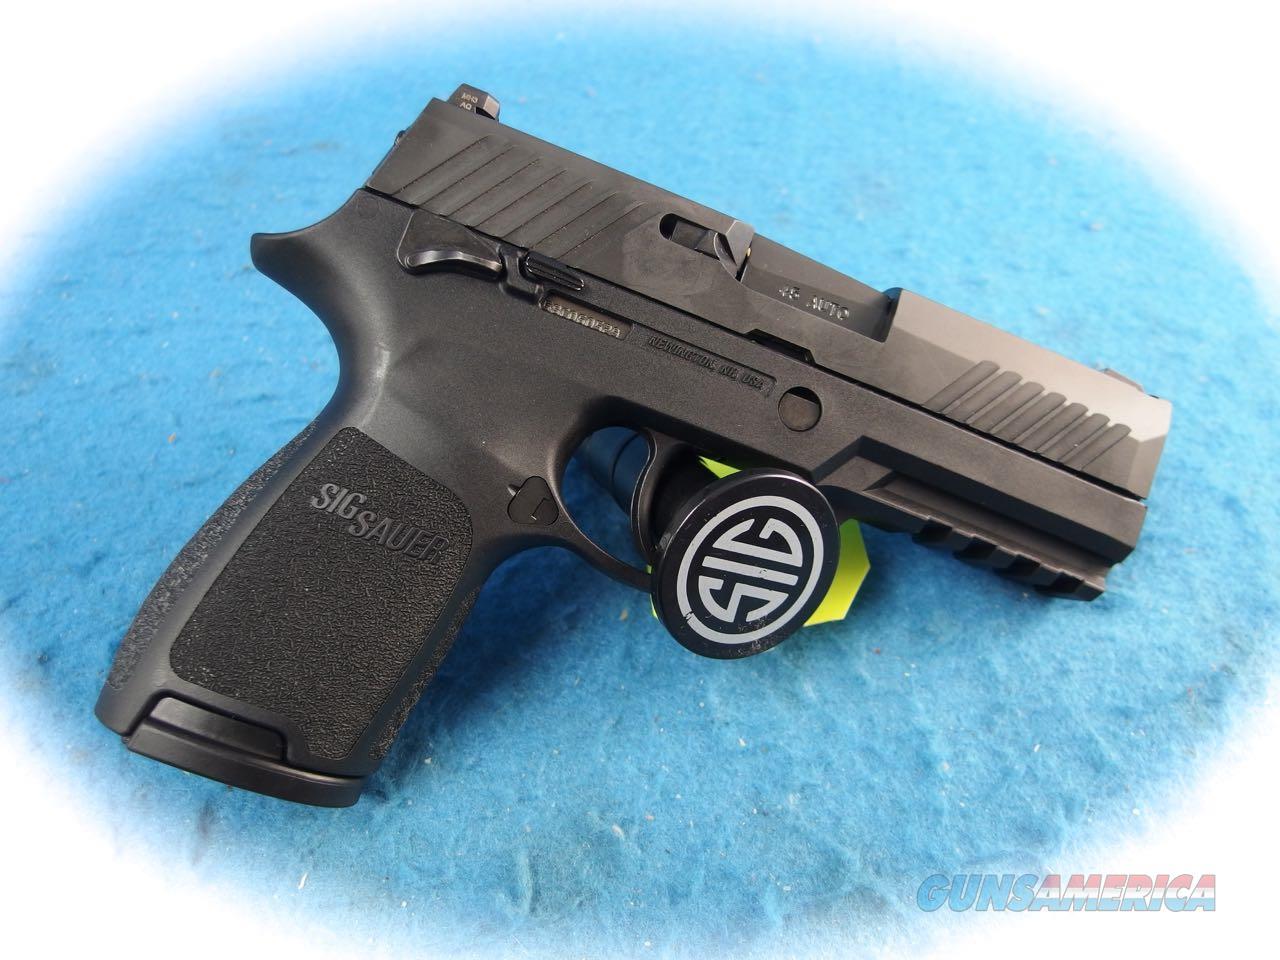 Sig Sauer P320C Nitron Compact .45 ACP Pistol W.Thumb Safety **New**  Guns > Pistols > Sig - Sauer/Sigarms Pistols > P320